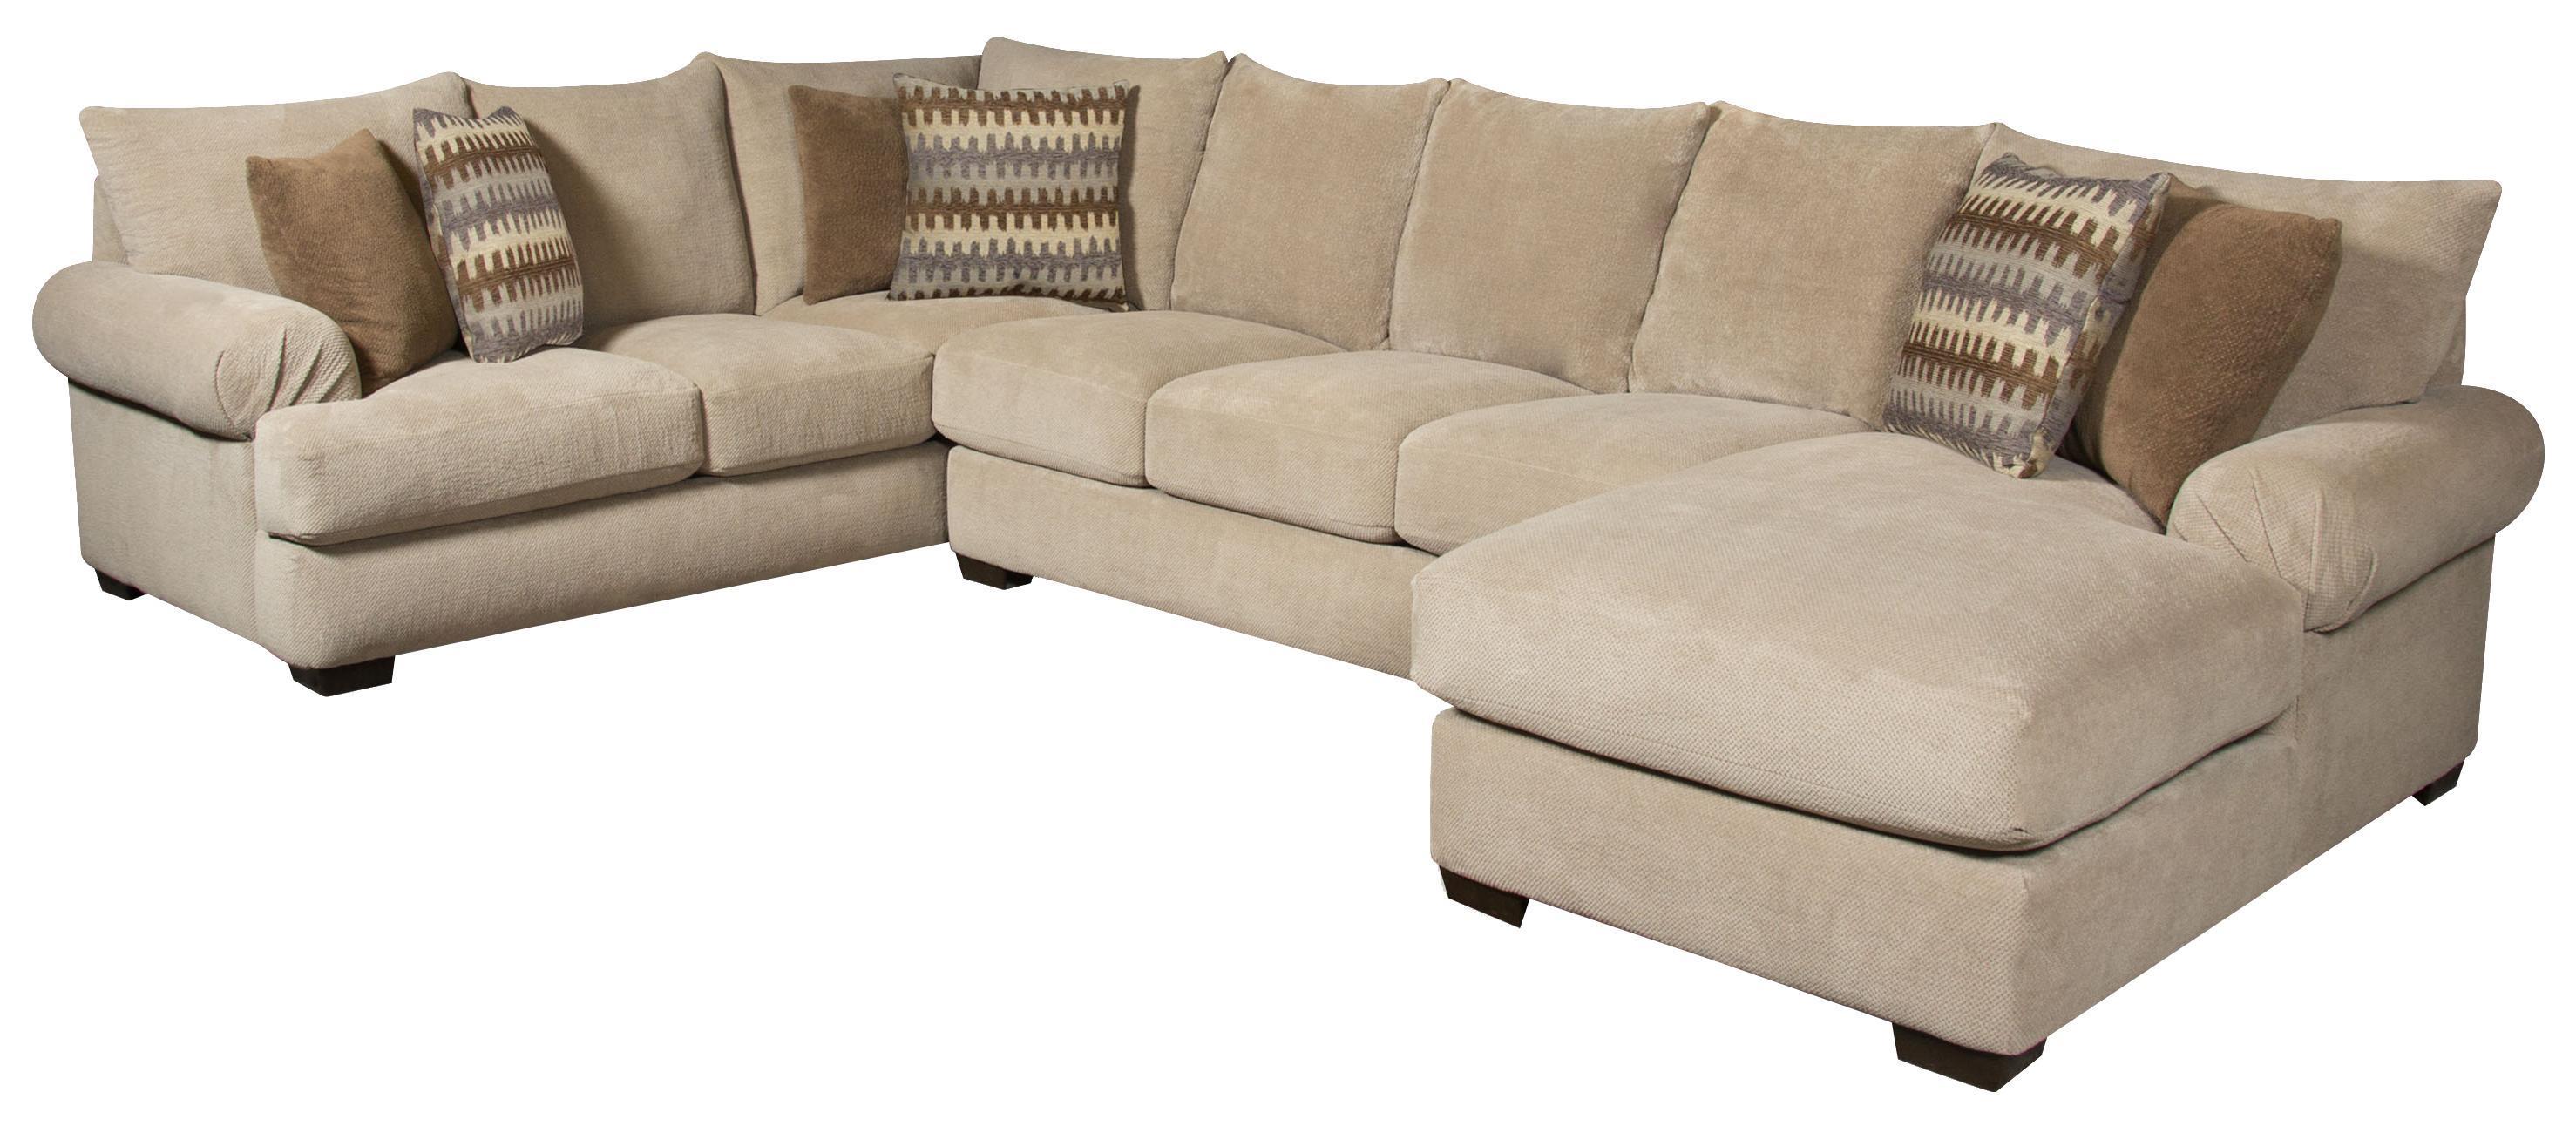 corinthian sofa reviews corinthian sofa reviews thesofa. Black Bedroom Furniture Sets. Home Design Ideas